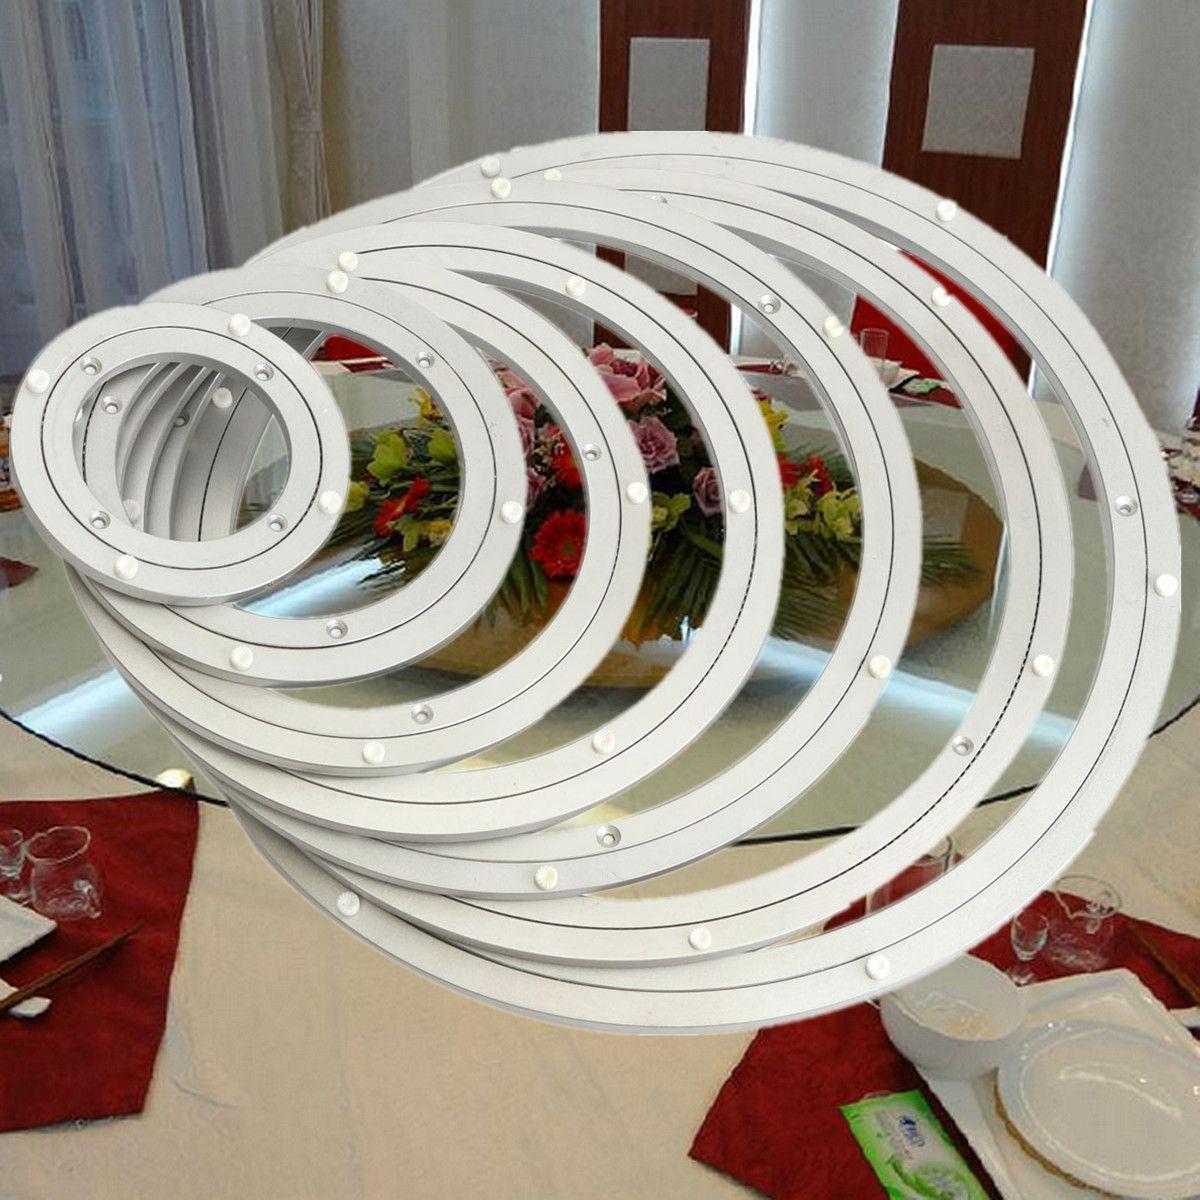 Swivel Platten Hardware 2019 Mode Schwere Aluminium Rotierenden Lager Plattenspieler Oberfläche Glatte Einfach Setup Turn Table Runde Schwenker-platte Geschraubt Oder Feste